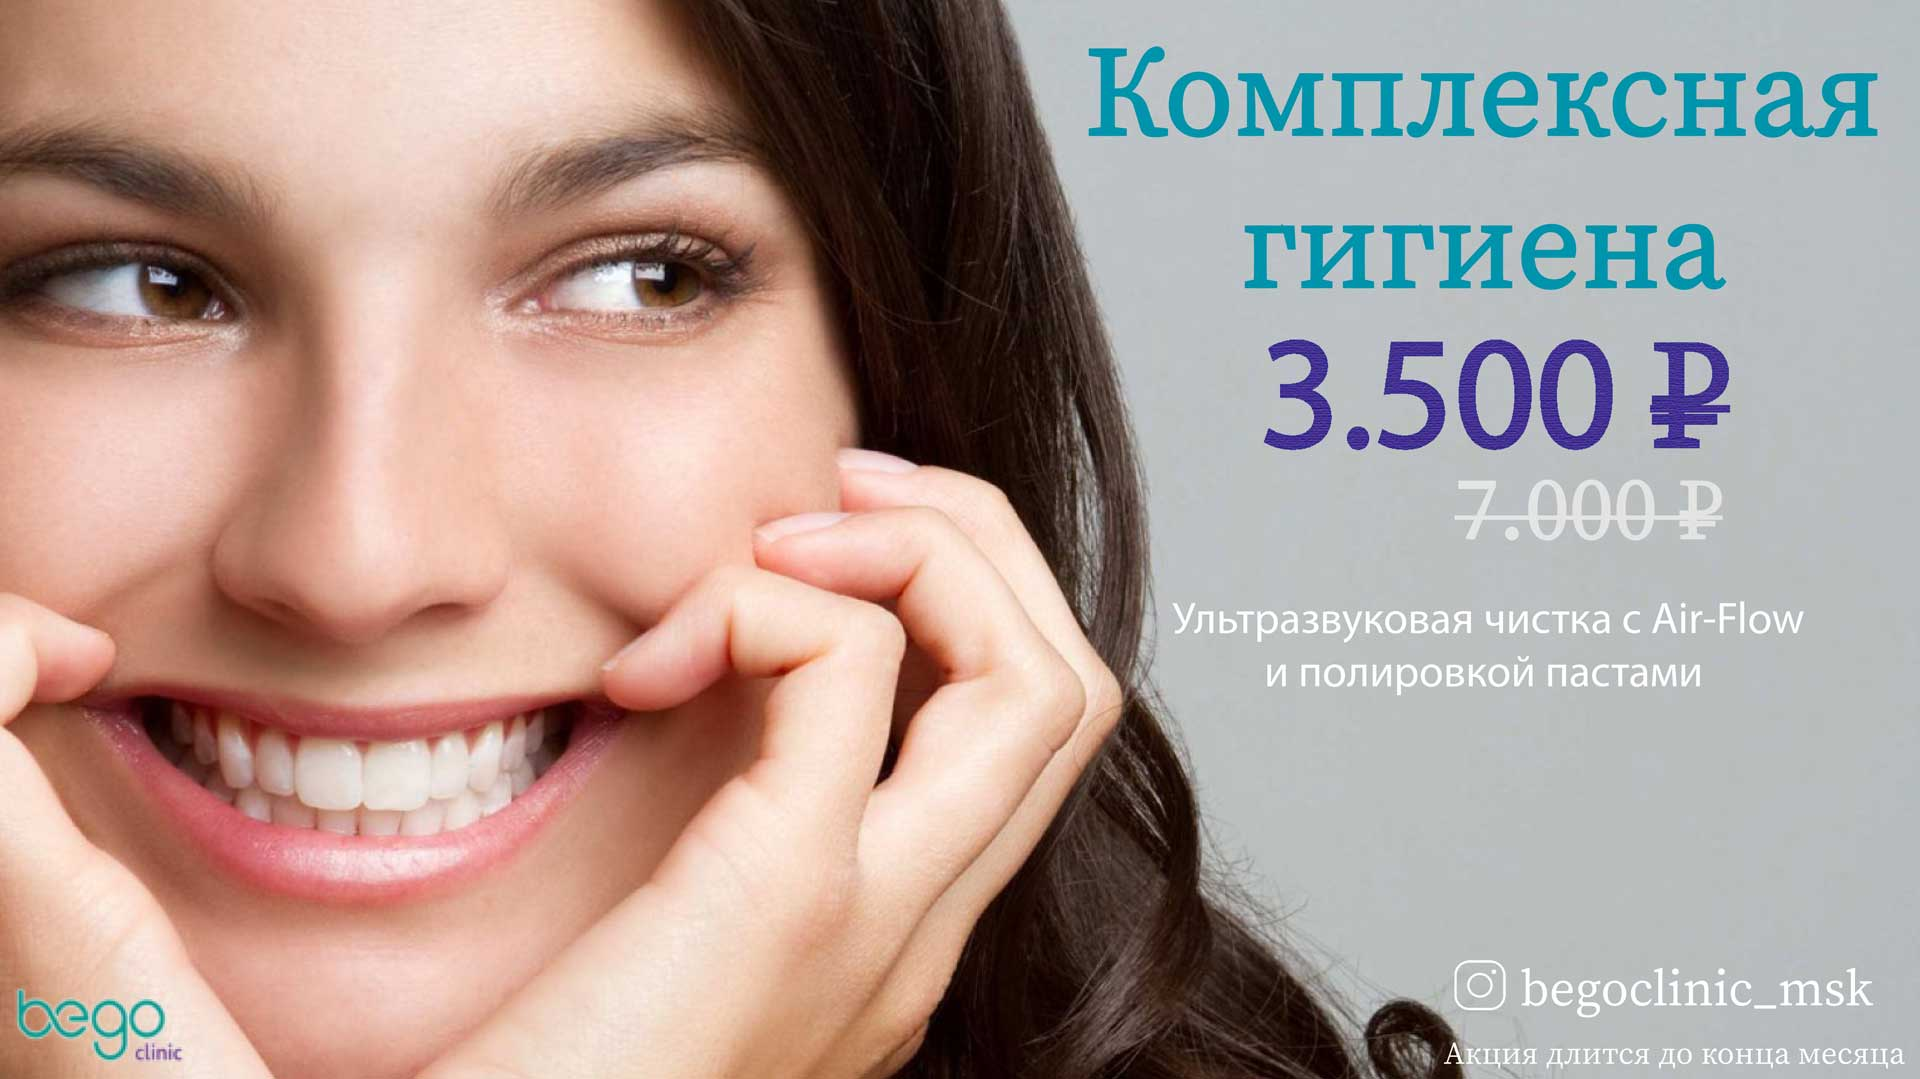 Комплексная гигиена за 3500 рублей